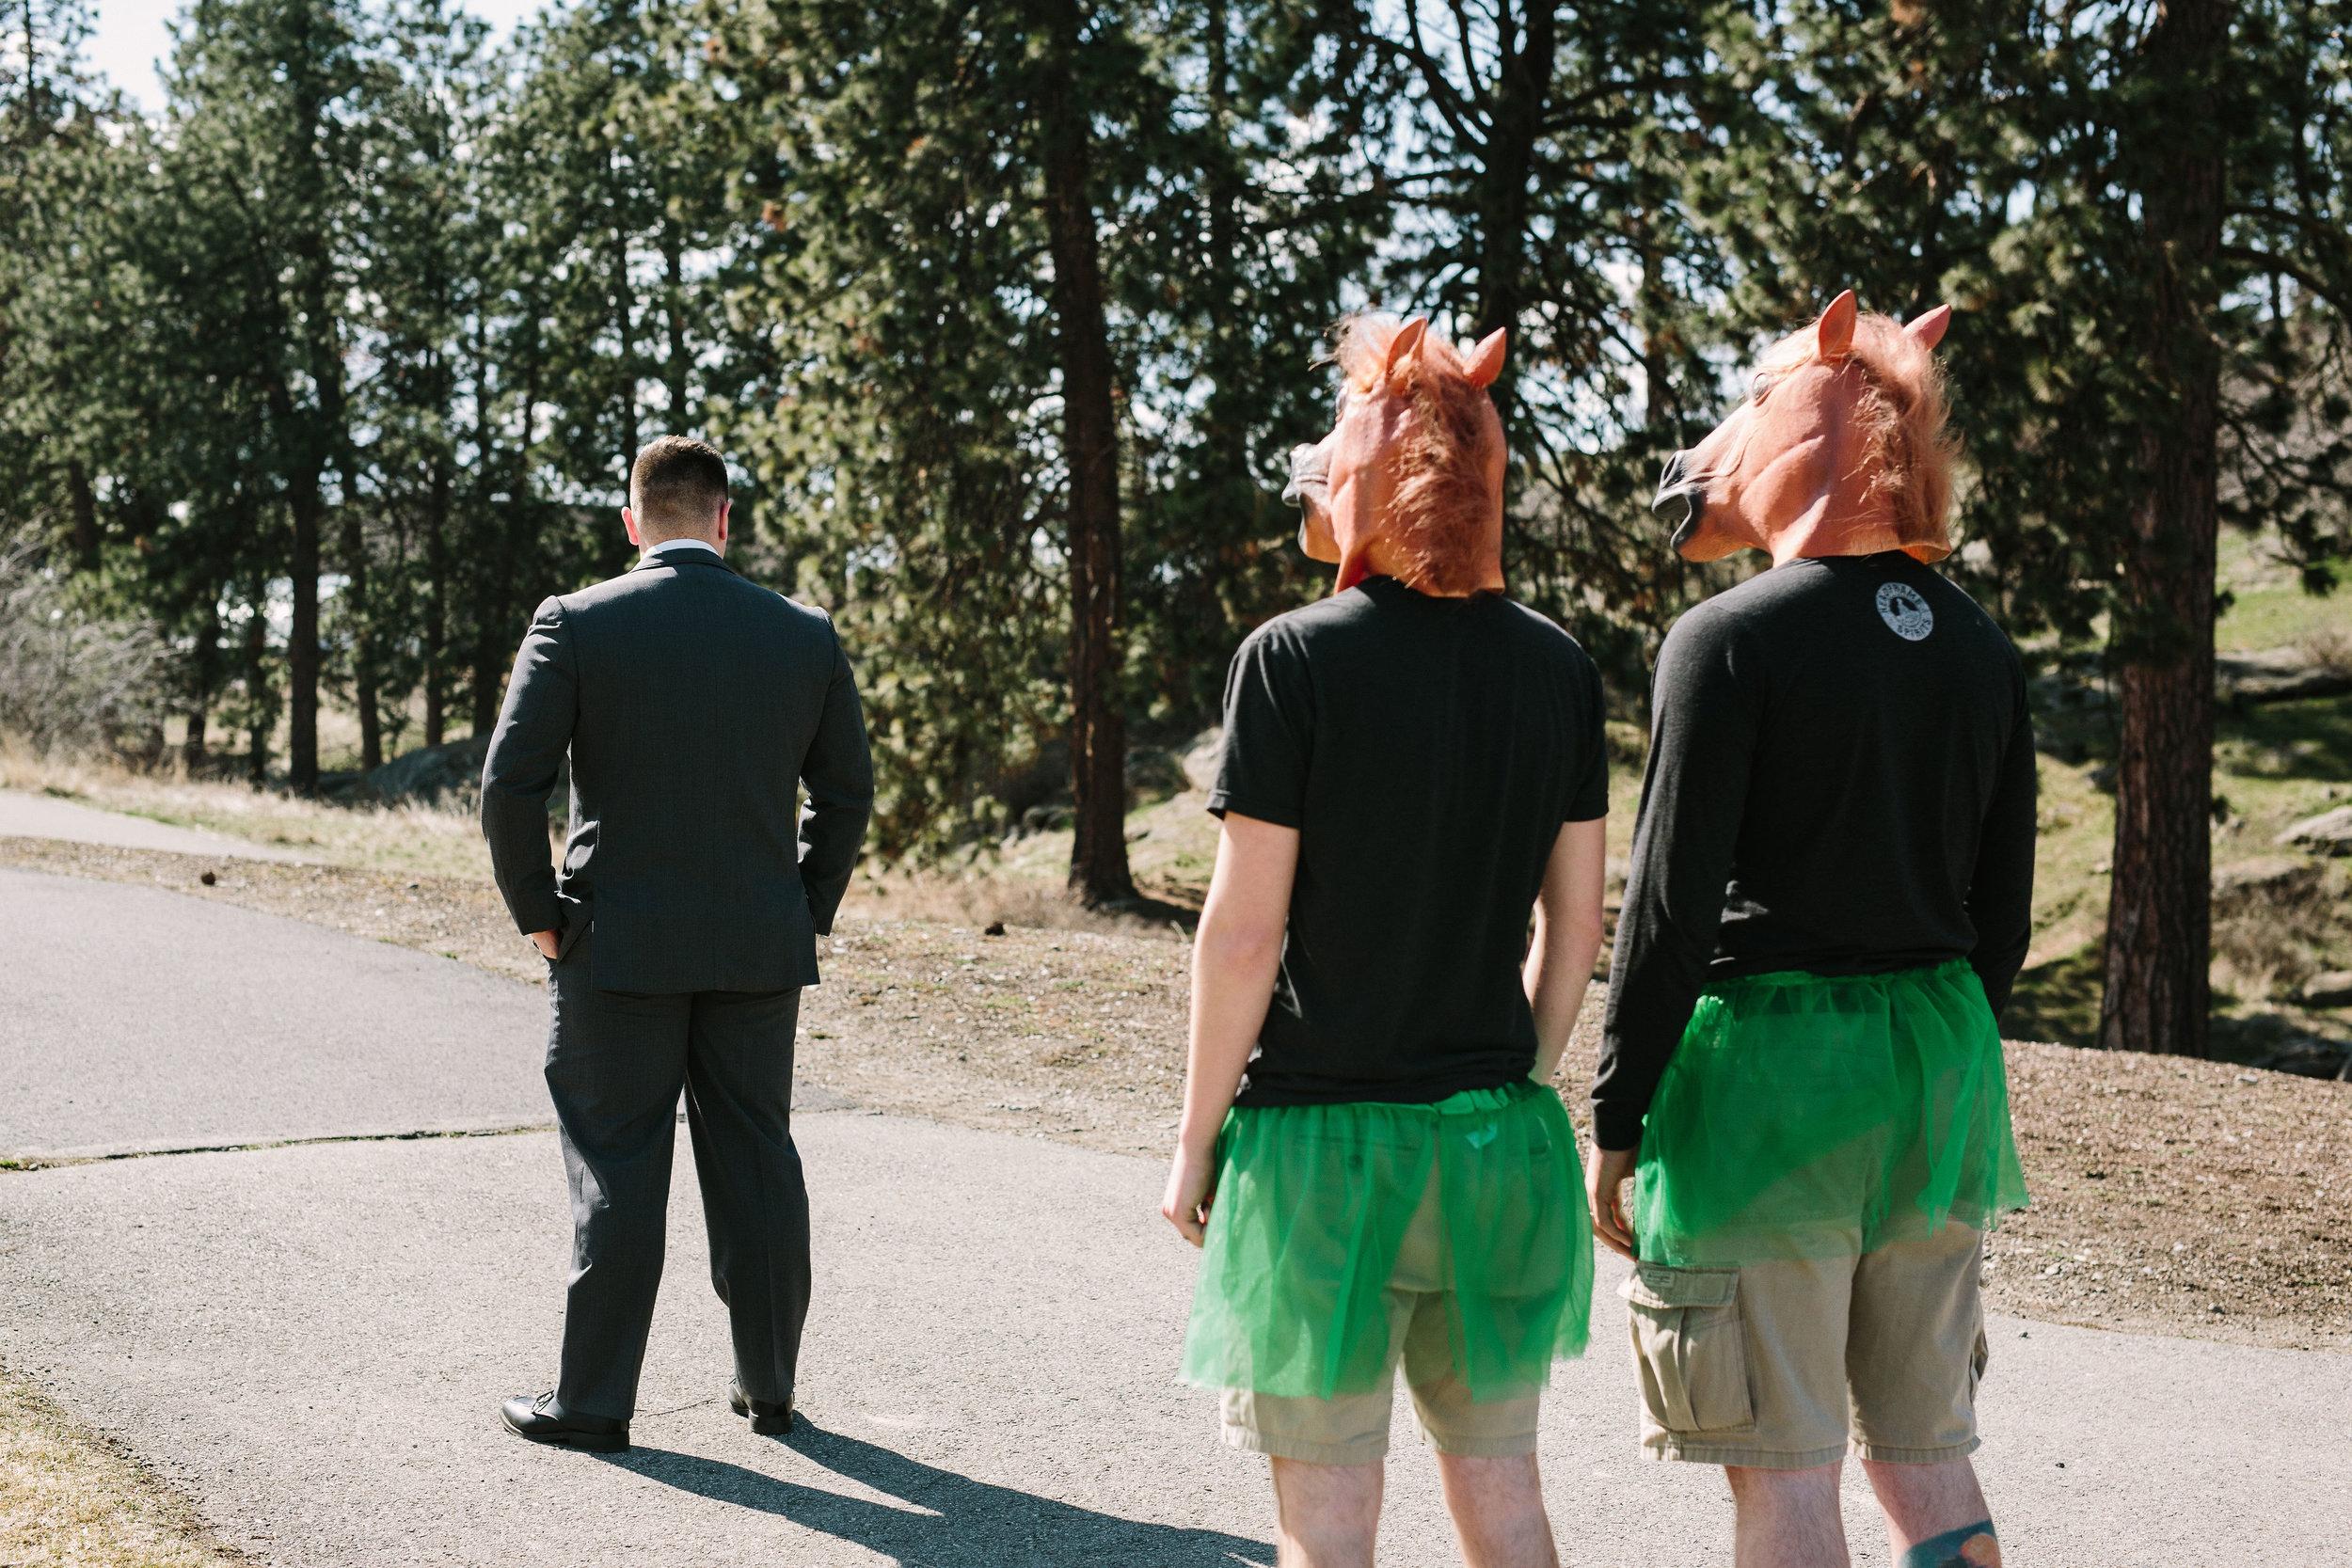 Fun Rustic spokane wedding groom laughing horse mask prank